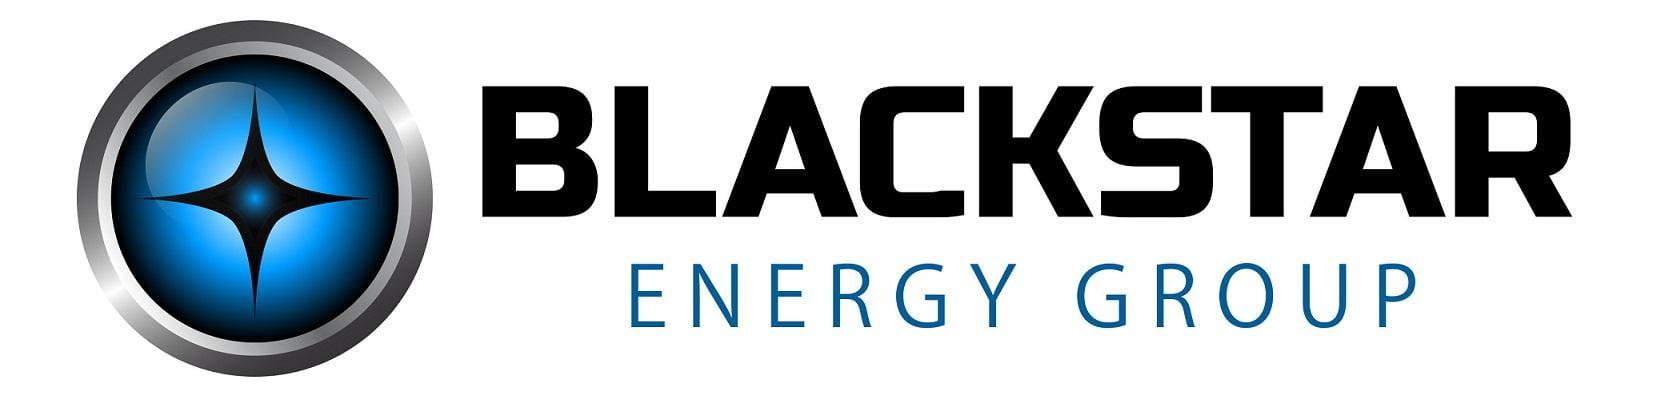 Blackstar Companies Announces New Business Division, Blackstar Energy Group